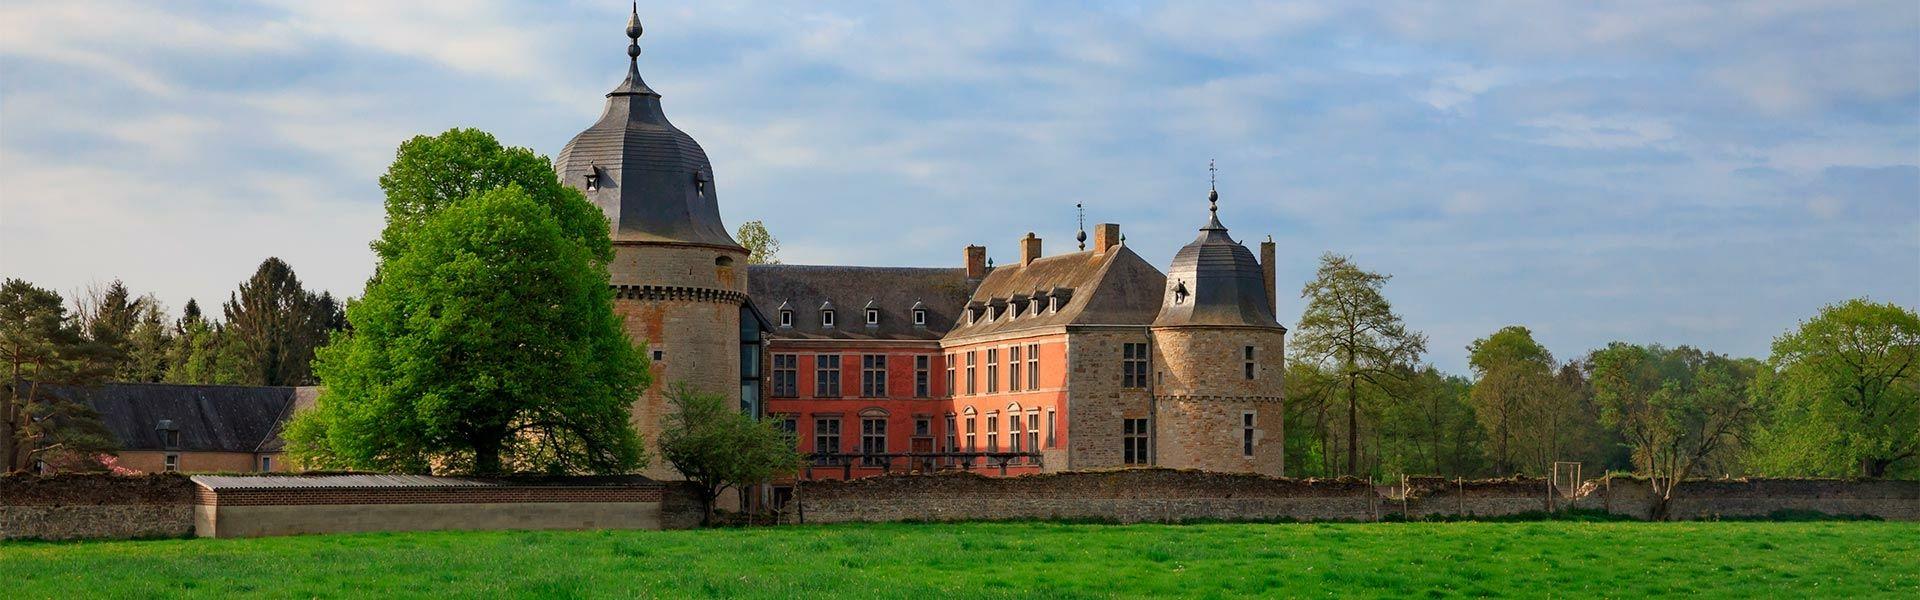 Camping Rochefort (Bélgica)